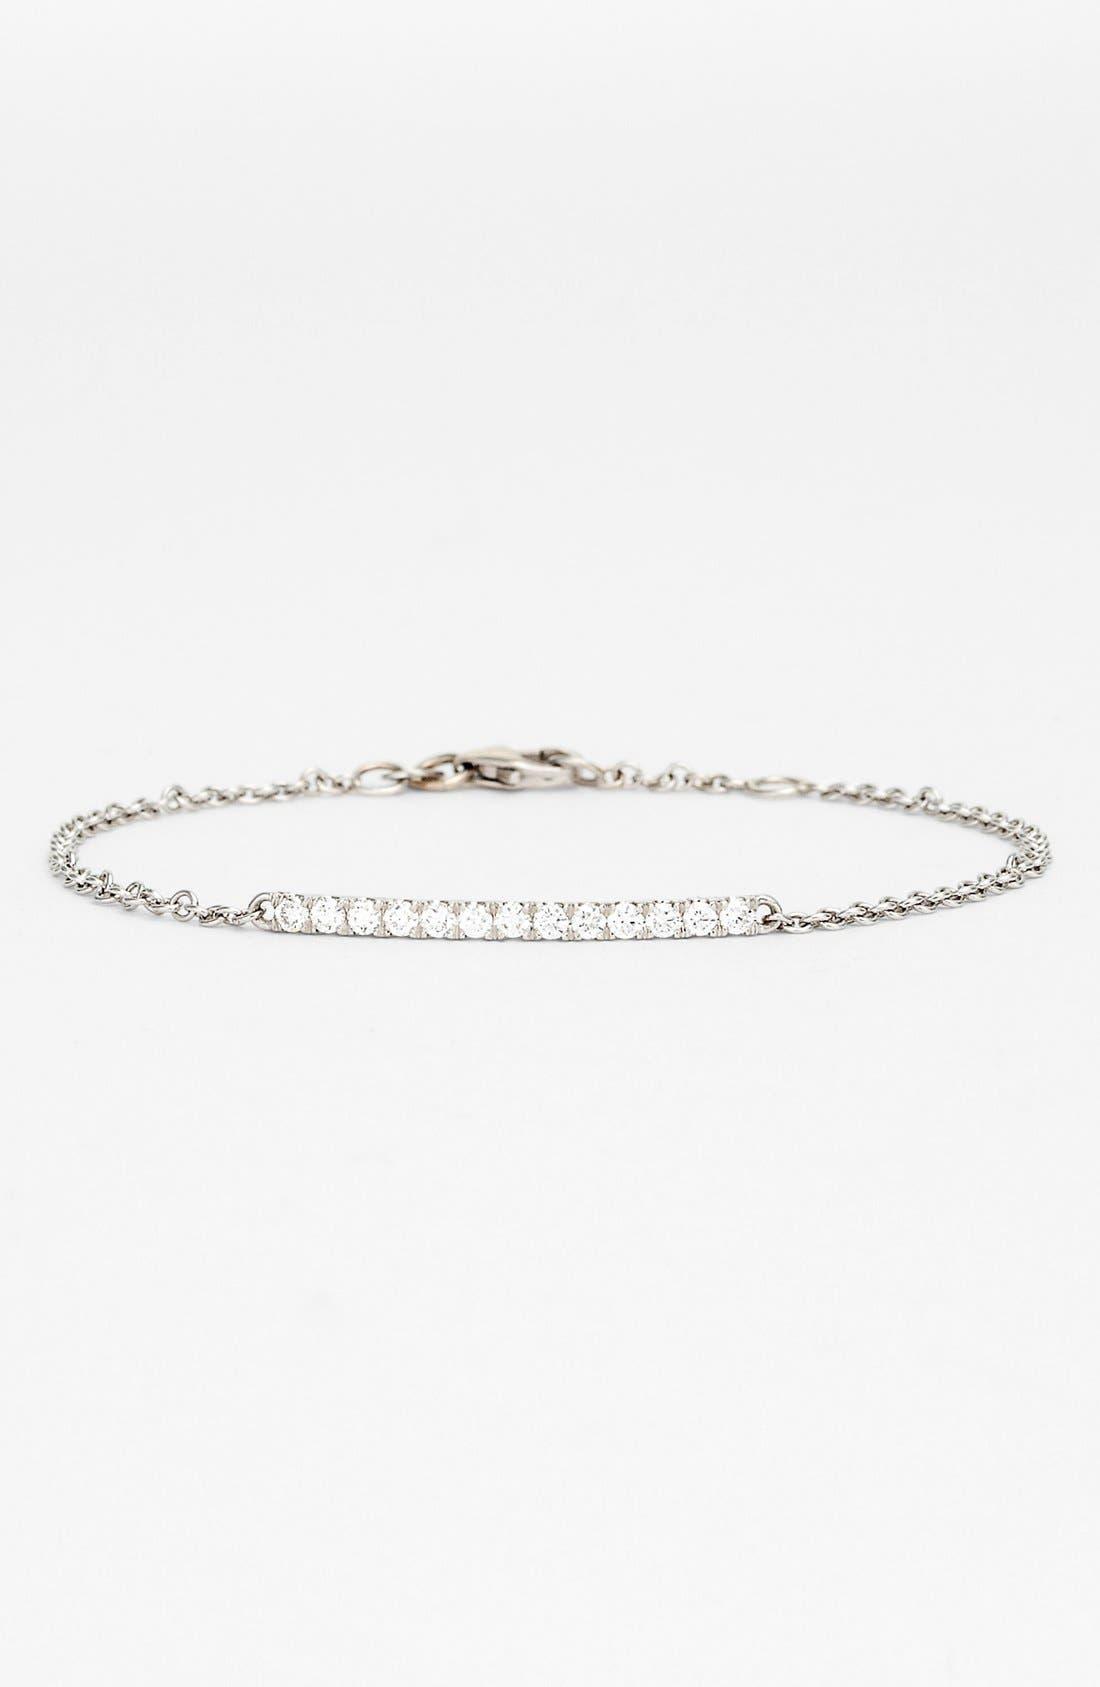 Alternate Image 1 Selected - Bony Levy 'Stick' Pavé Diamond Bar Bracelet (Nordstrom Exclusive)